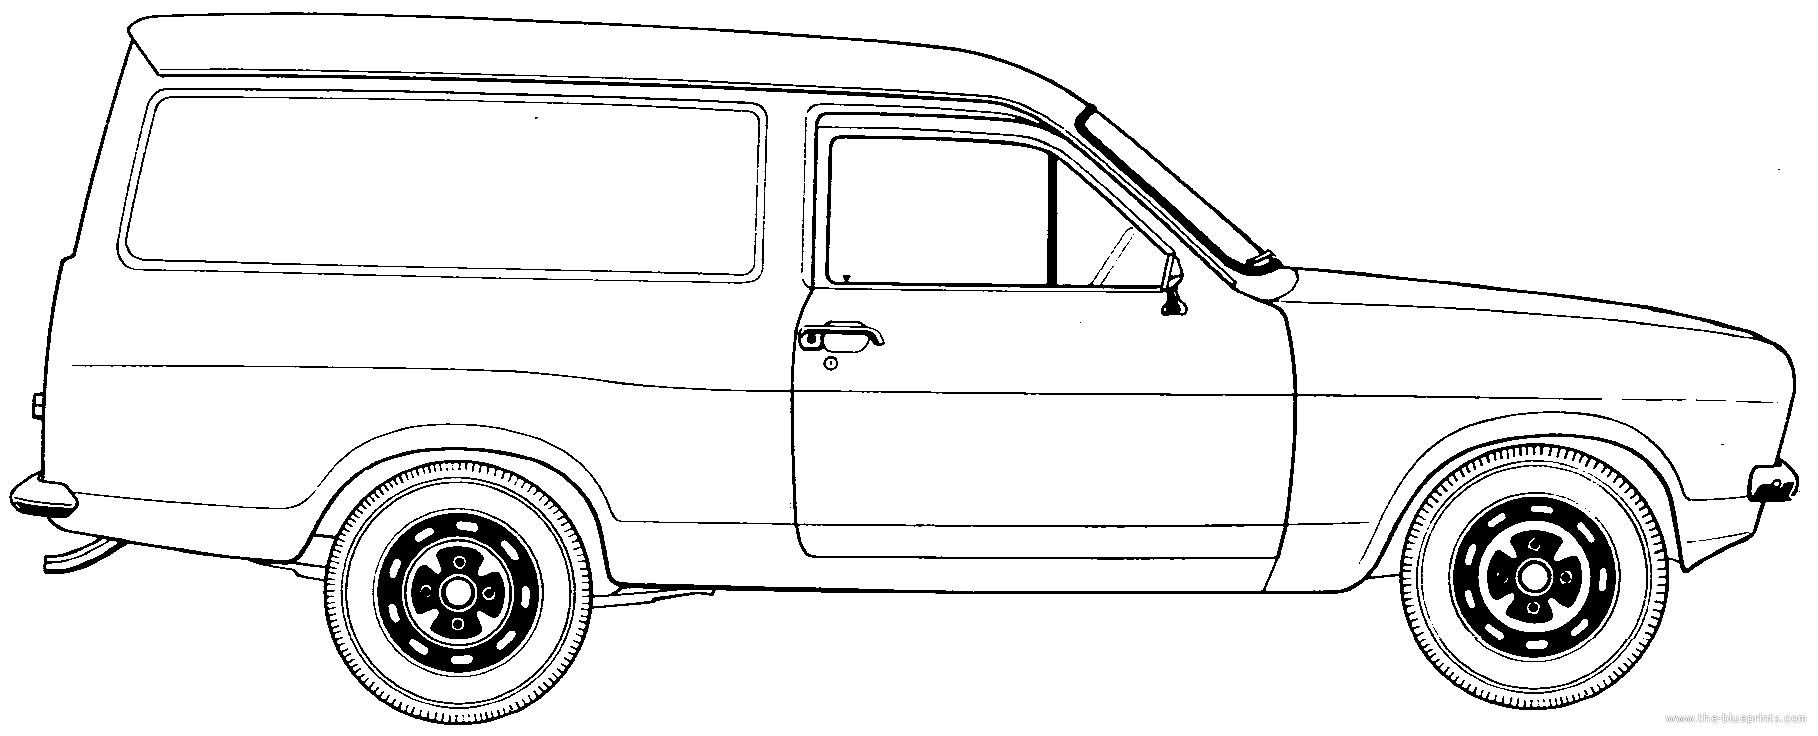 Blueprints > Cars > Ford > Ford Escort Mk.II Van (1975)